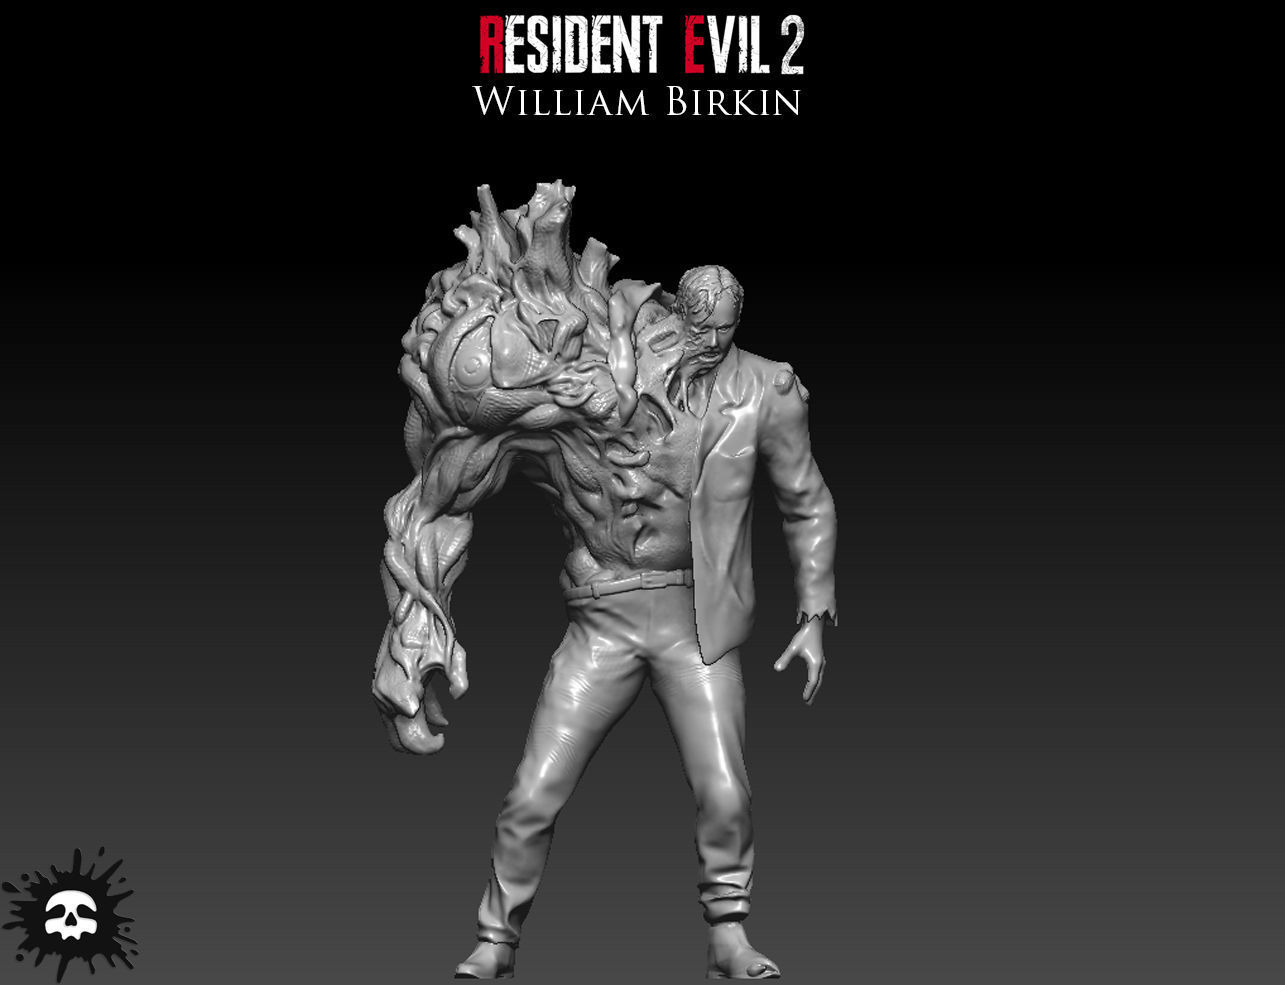 3d Printable Model Resident Evil 2 William Birkin